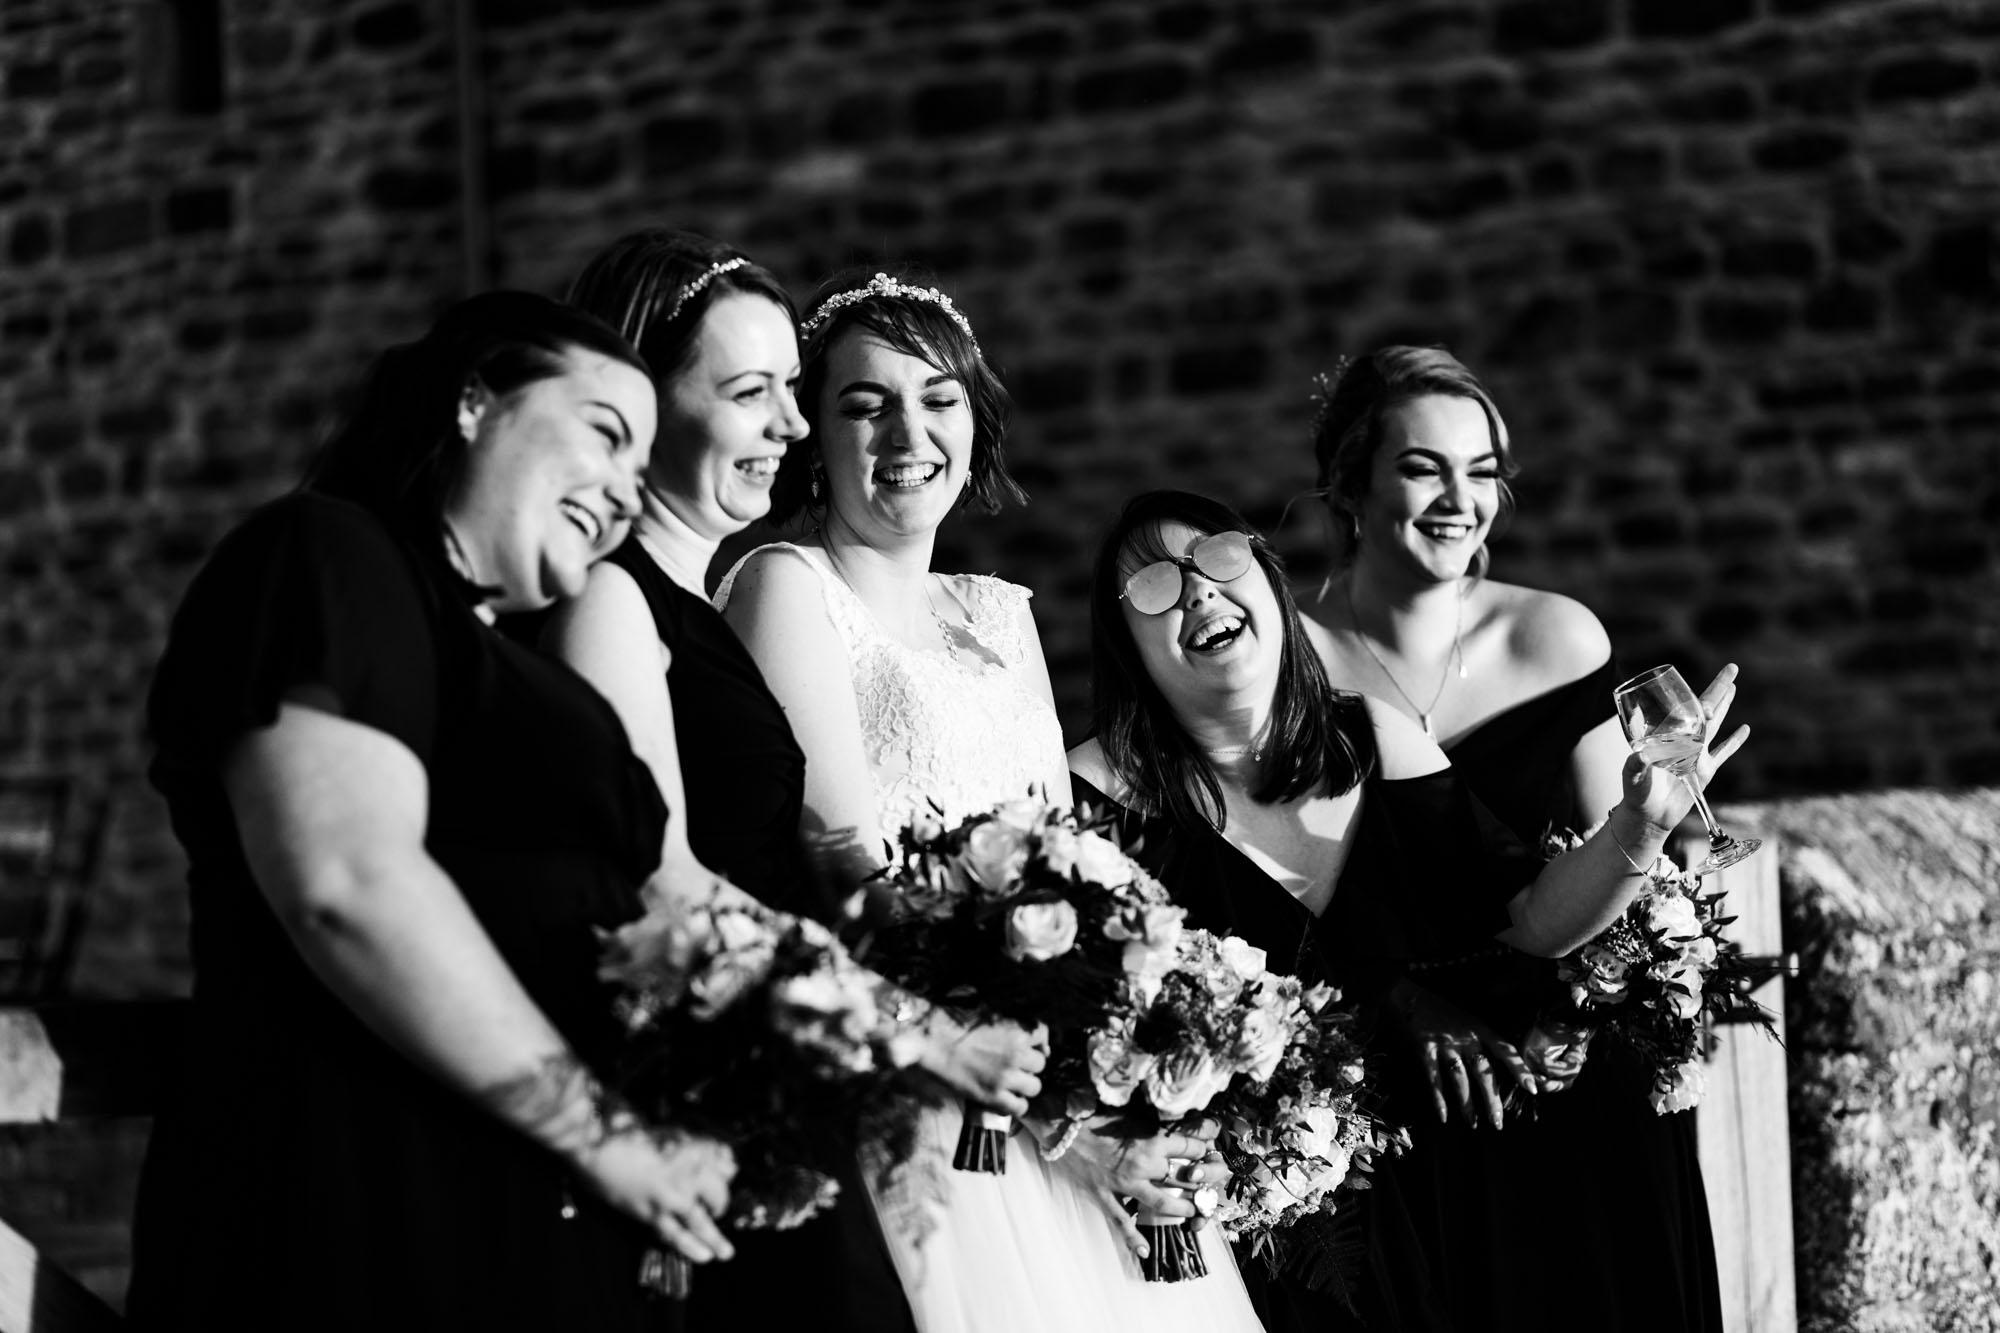 wedding-at-dodford-manor-71